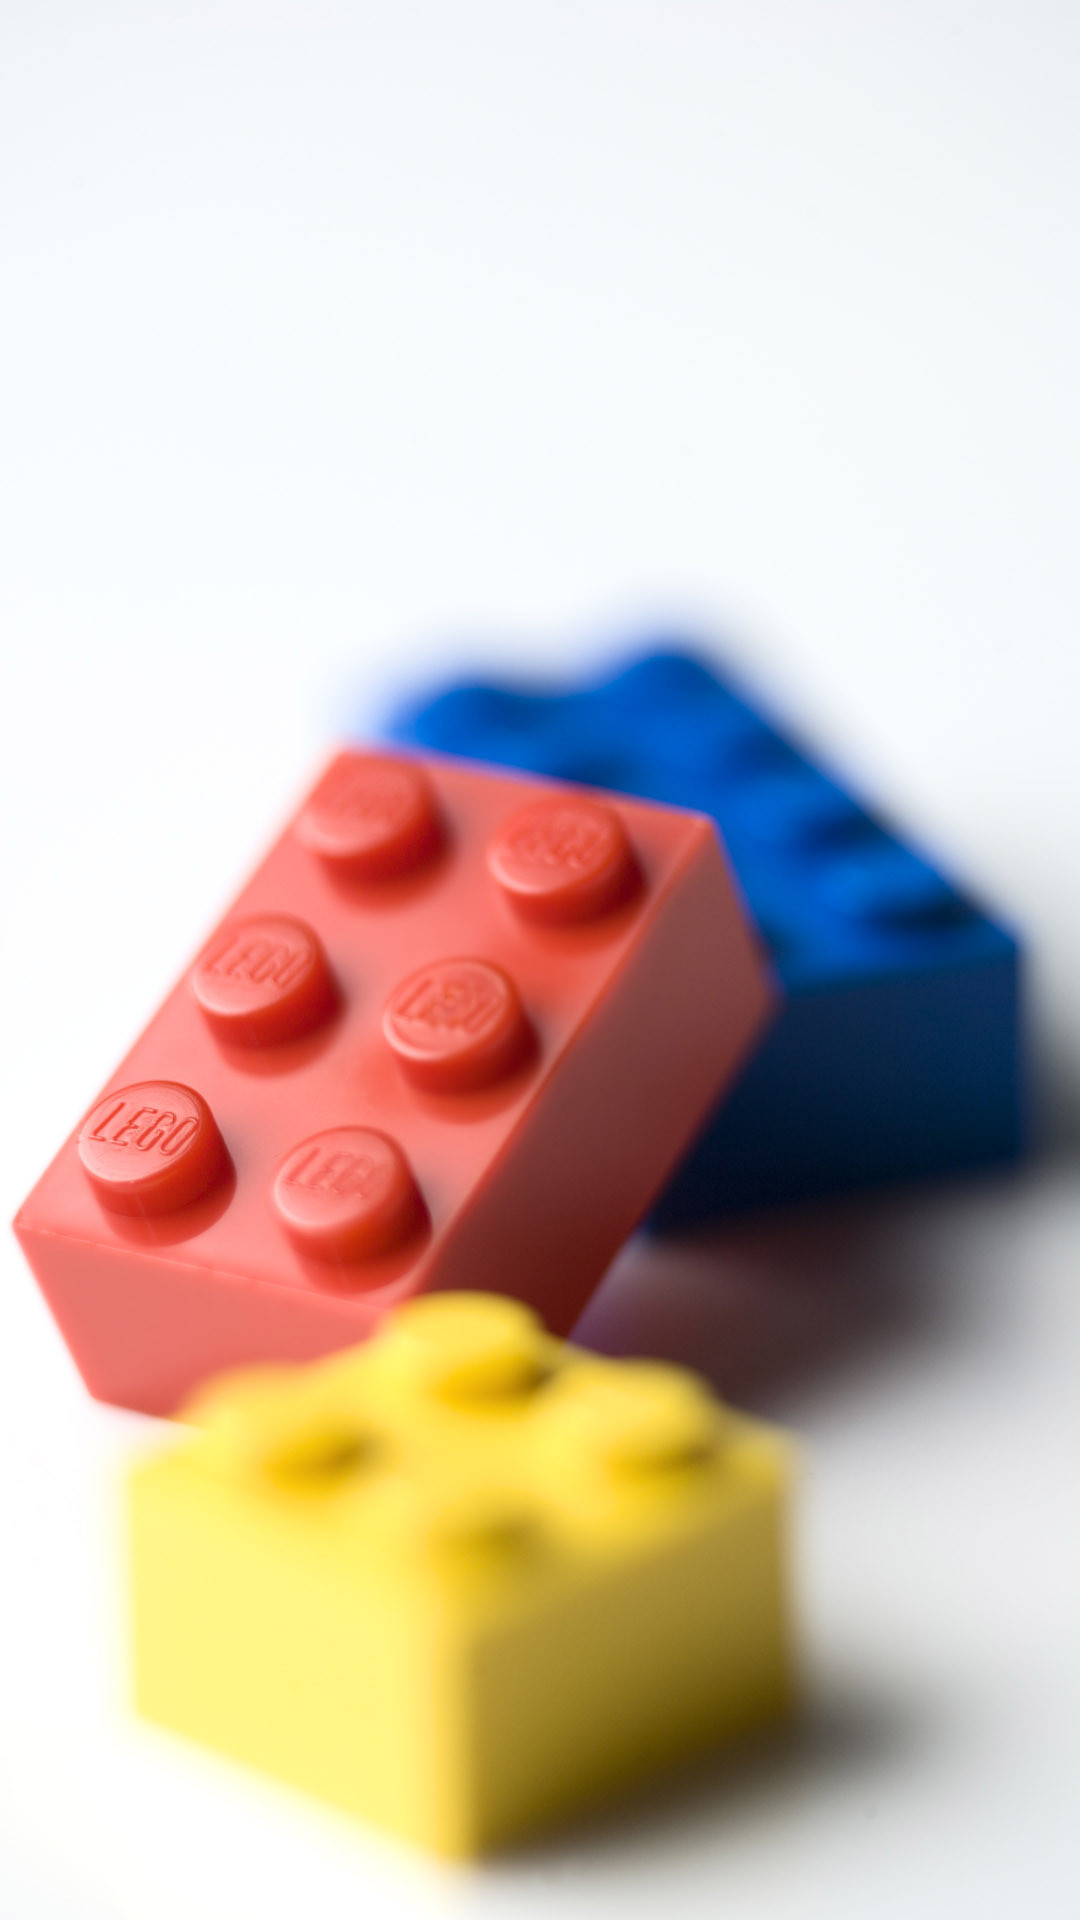 Lego Blocks Wallpaper (64+ images)